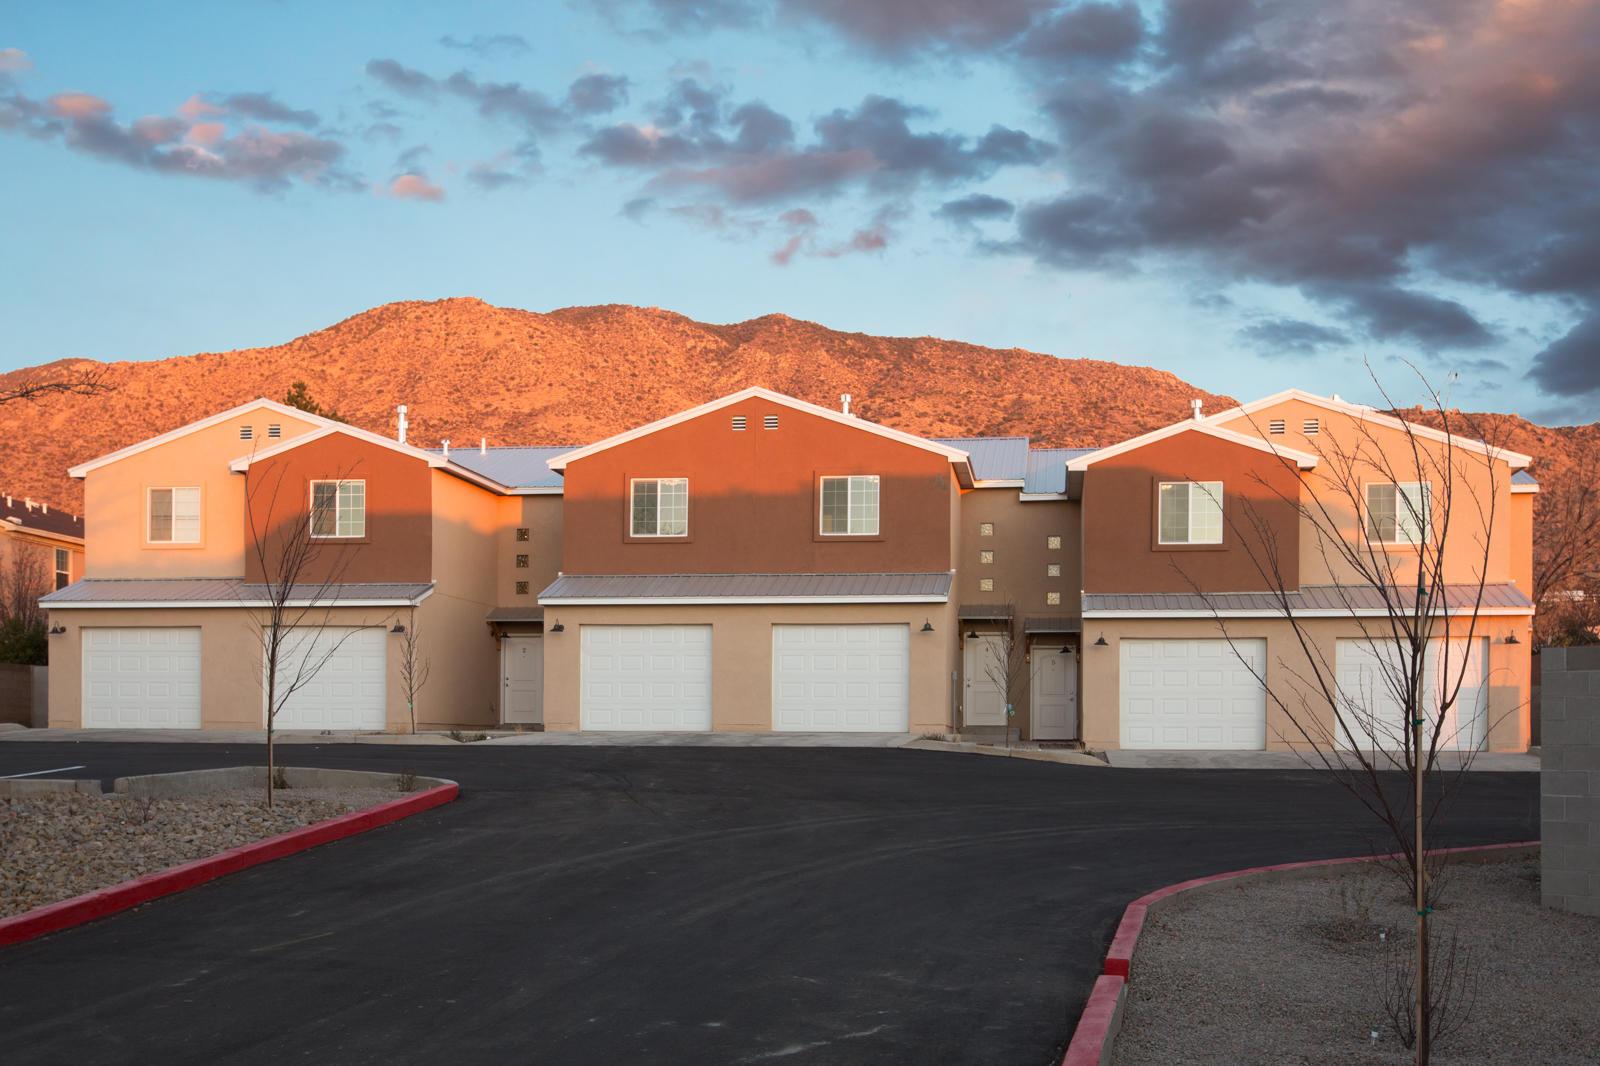 Tramway Townhomes NE, Albuquerque, NM 87112 - Albuquerque, NM real estate listing